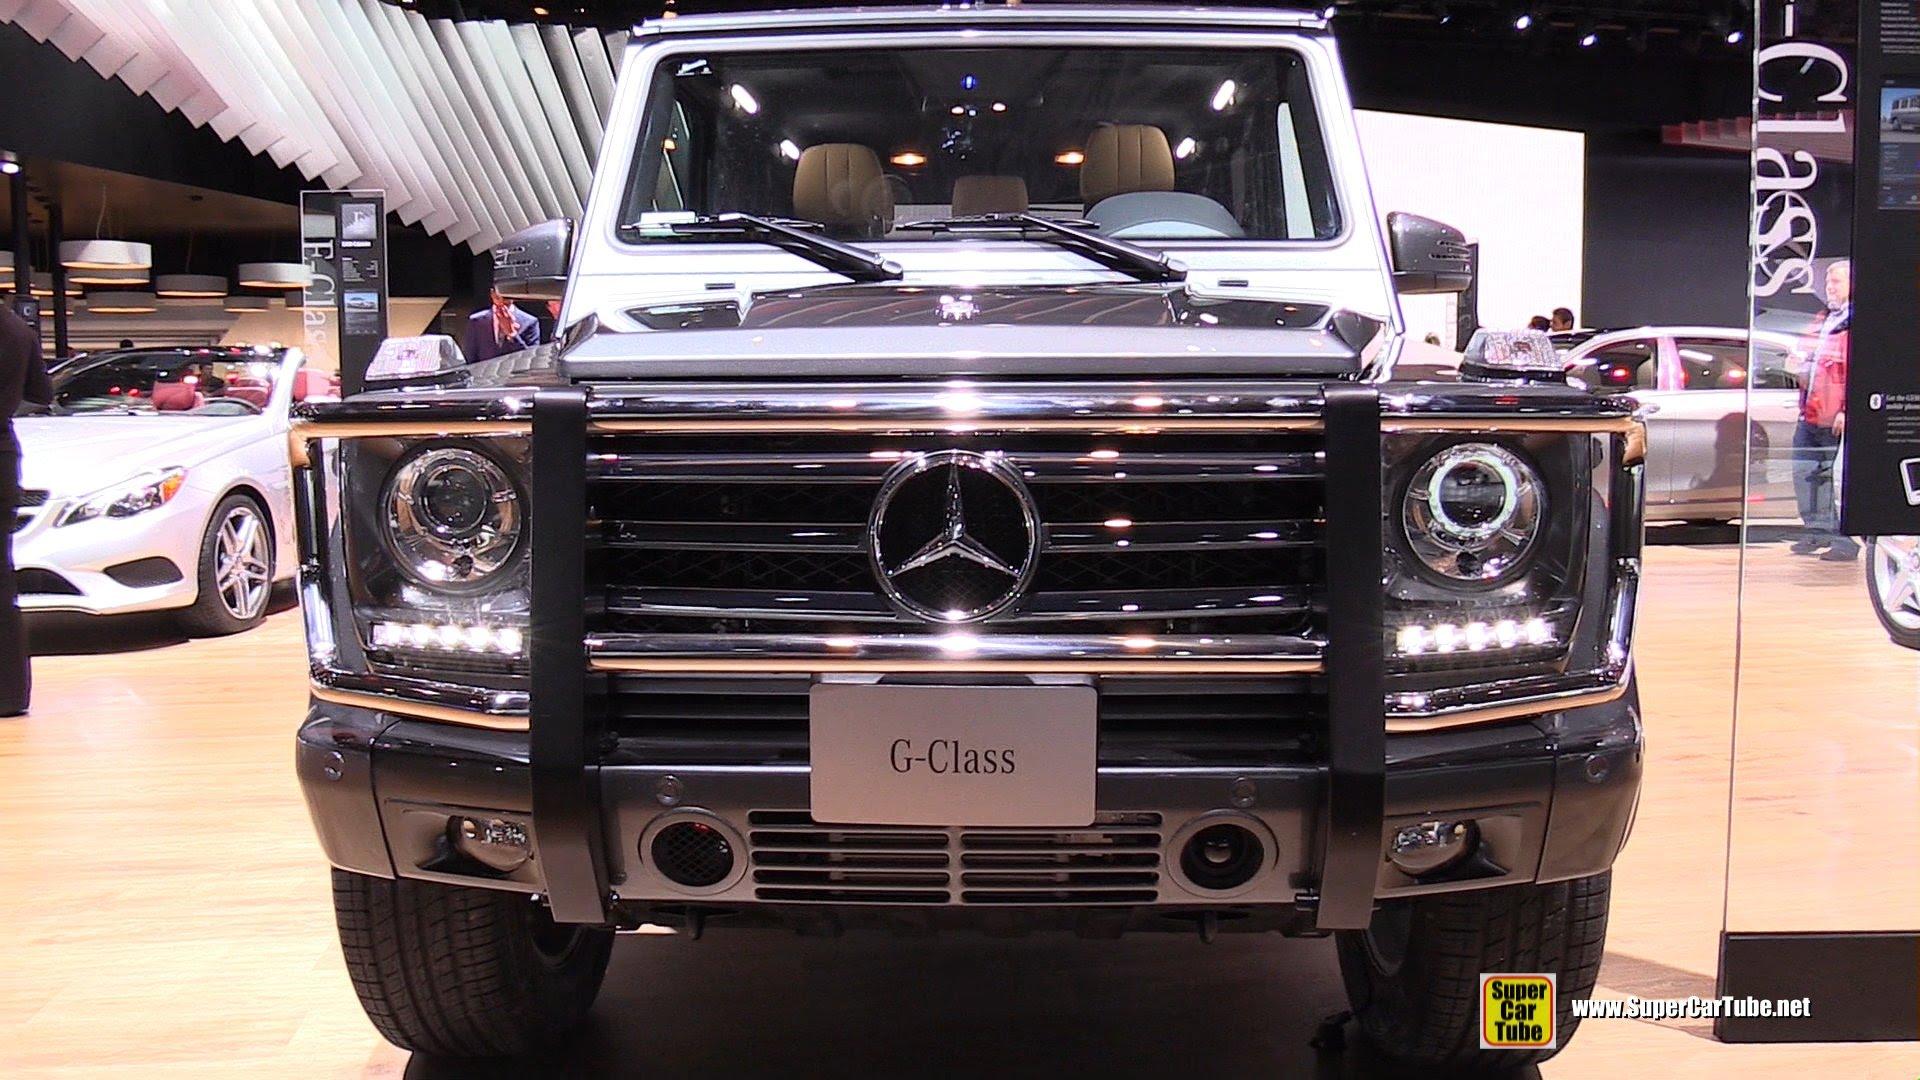 Mercedes-Benz G-klasse II (W463) Restyling 3 2012 - 2015 SUV #6